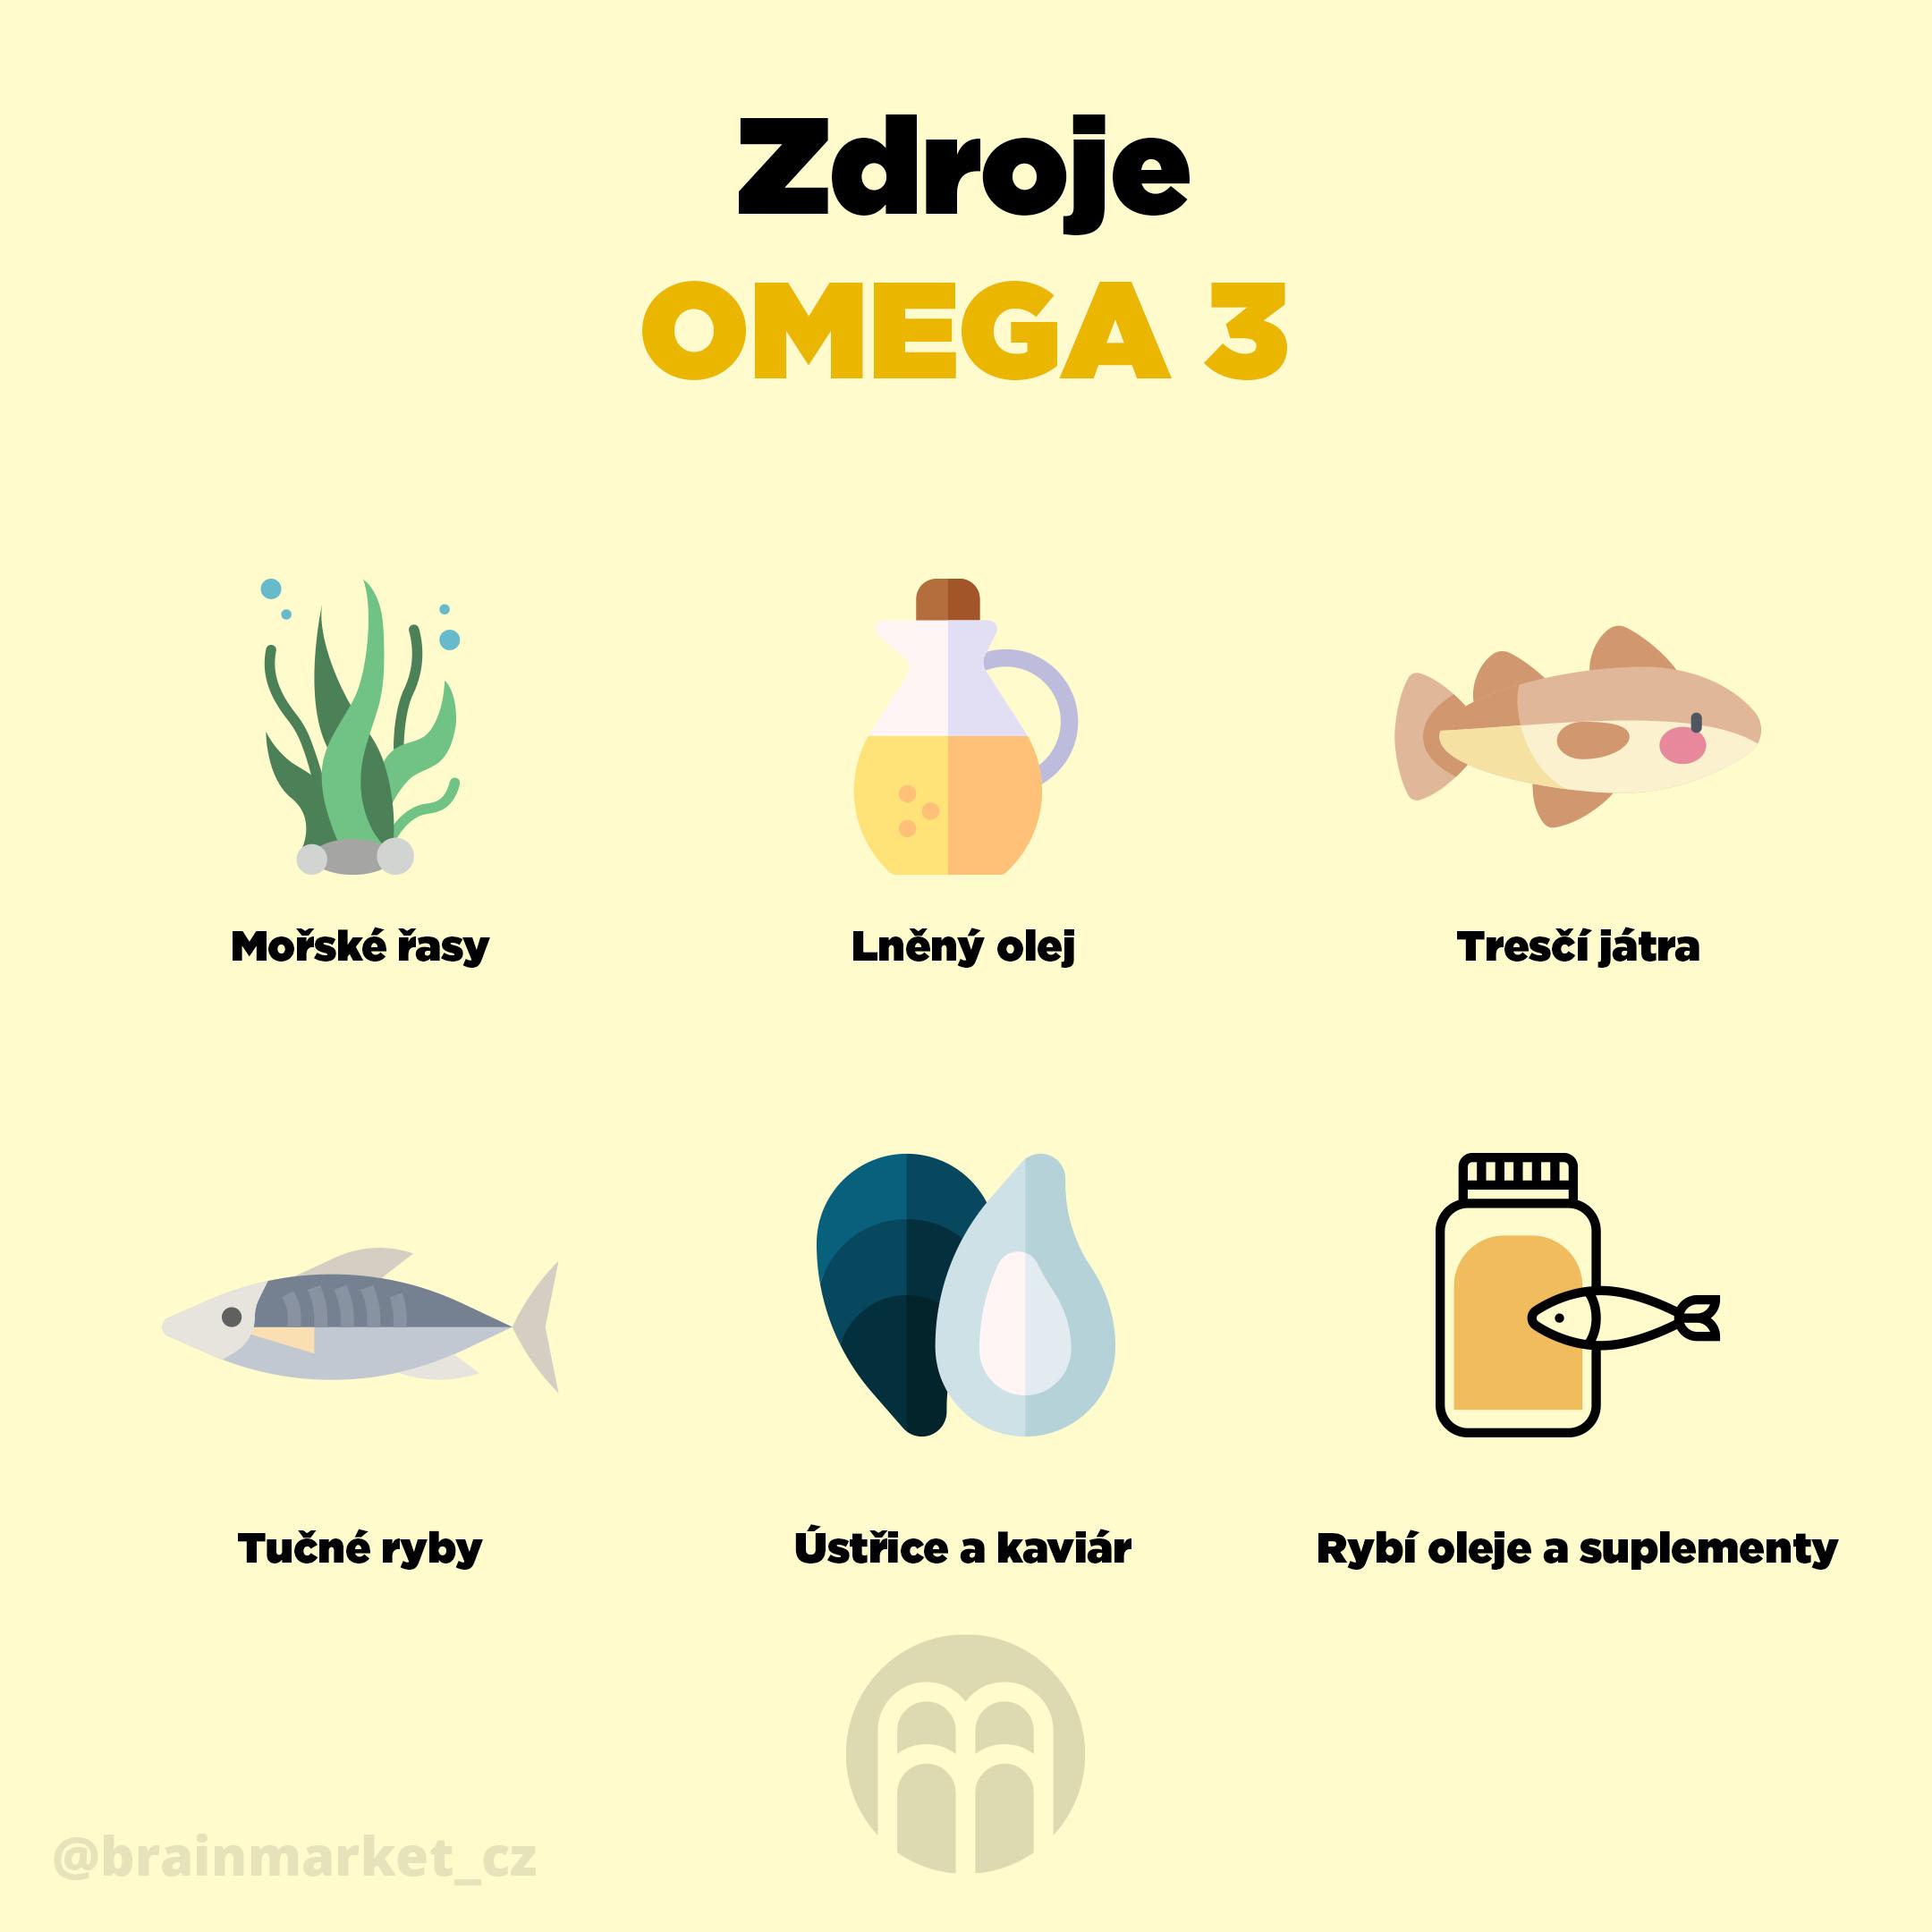 zdroje-omega-3-infografika-brainmarket-cz